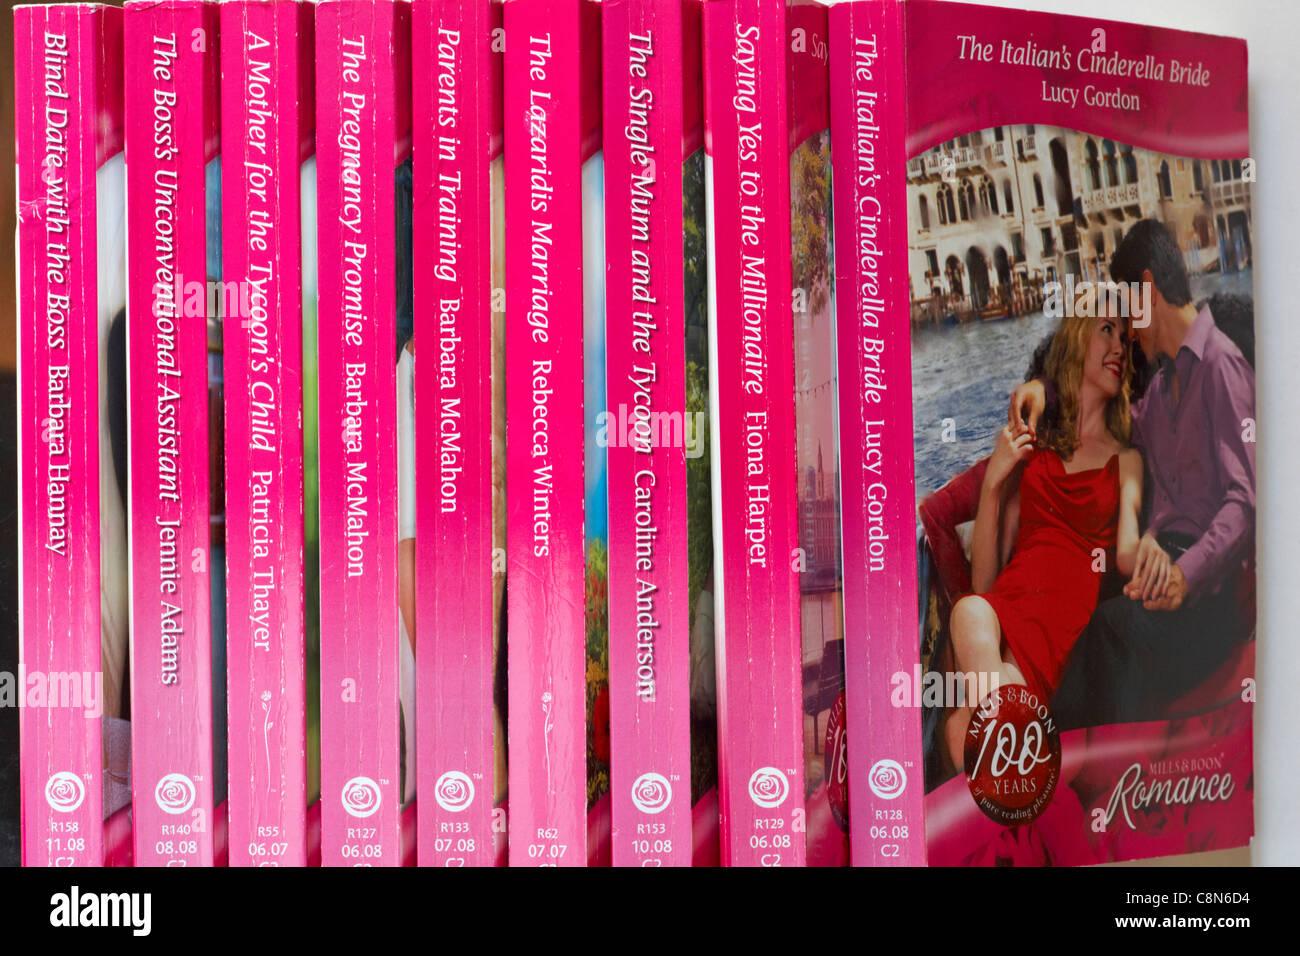 row of Mills & Boon Romance novels Stock Photo: 39804048 - Alamy